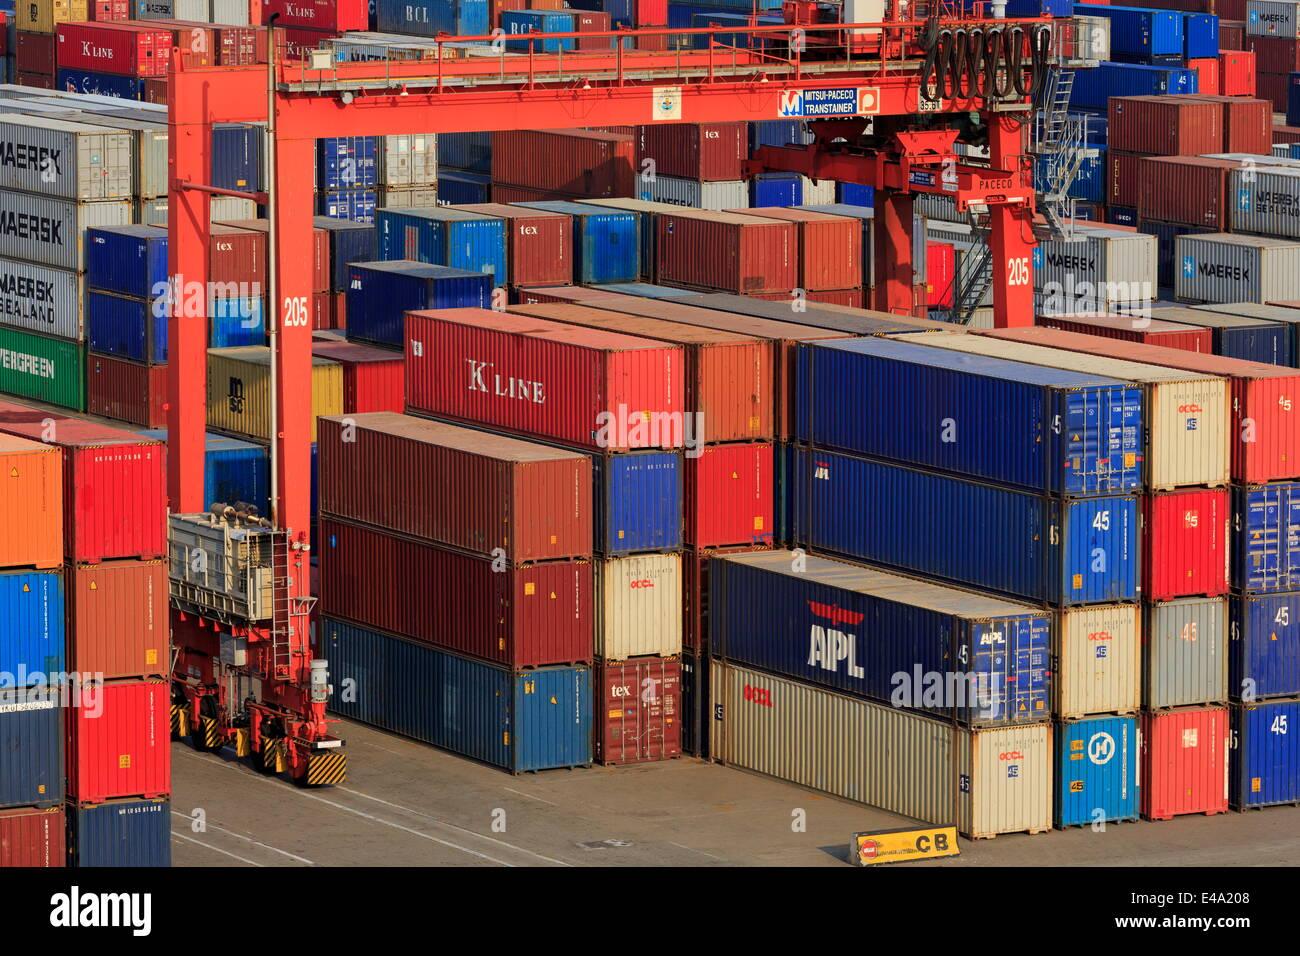 Container port, Sihanoukville Port, Sihanouk Province, Cambodia, Indochina, Southeast Asia, Asia - Stock Image